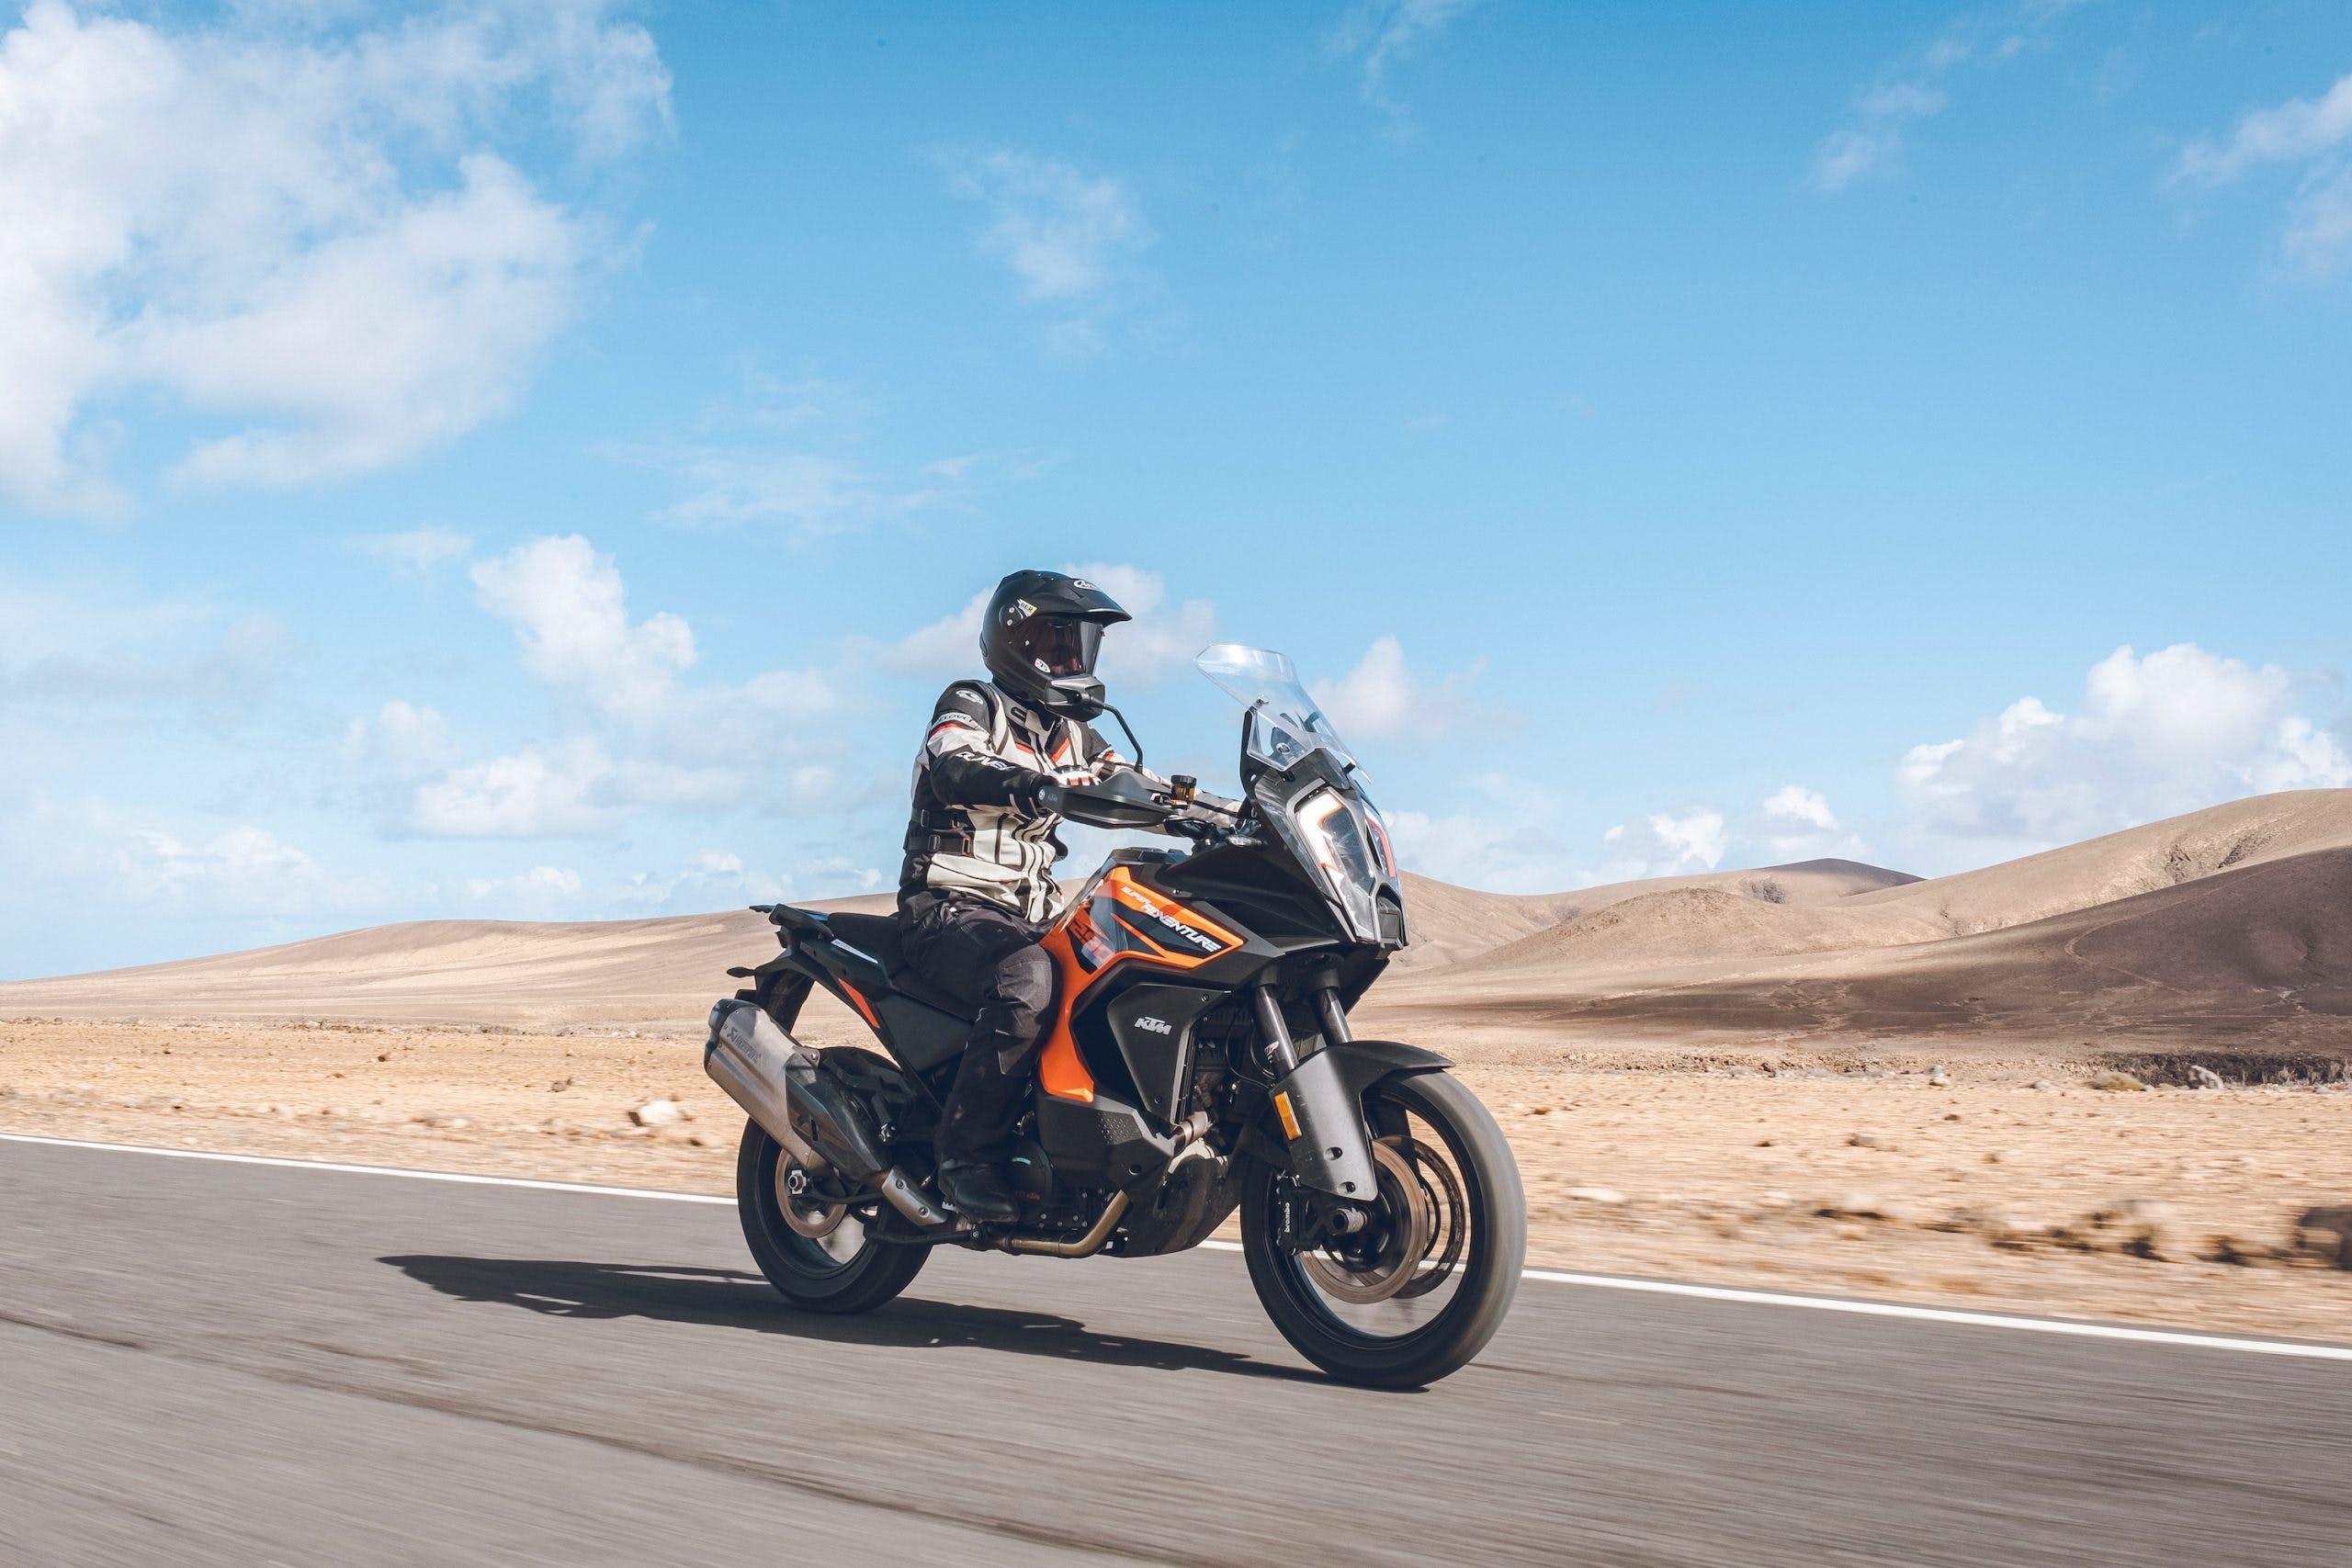 KTM-SUPER-ADVENTURE-1290-S-MY-2021 camera bike vicino alle dune